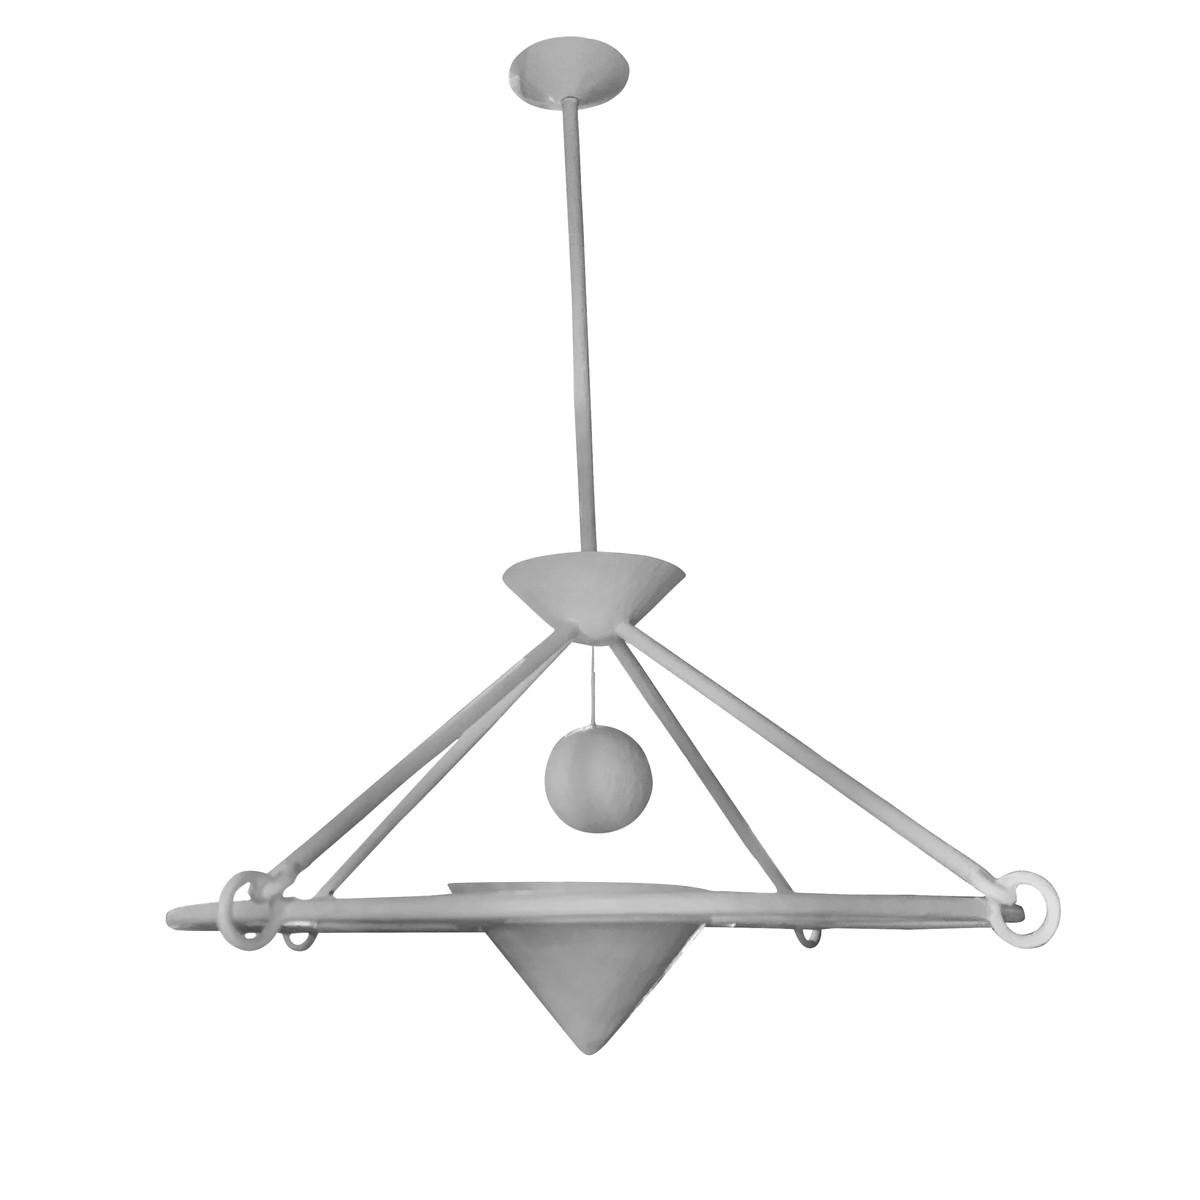 best website d7d8f af261 Balsamo Antiques | Contemporary English White Plaster Chandelier